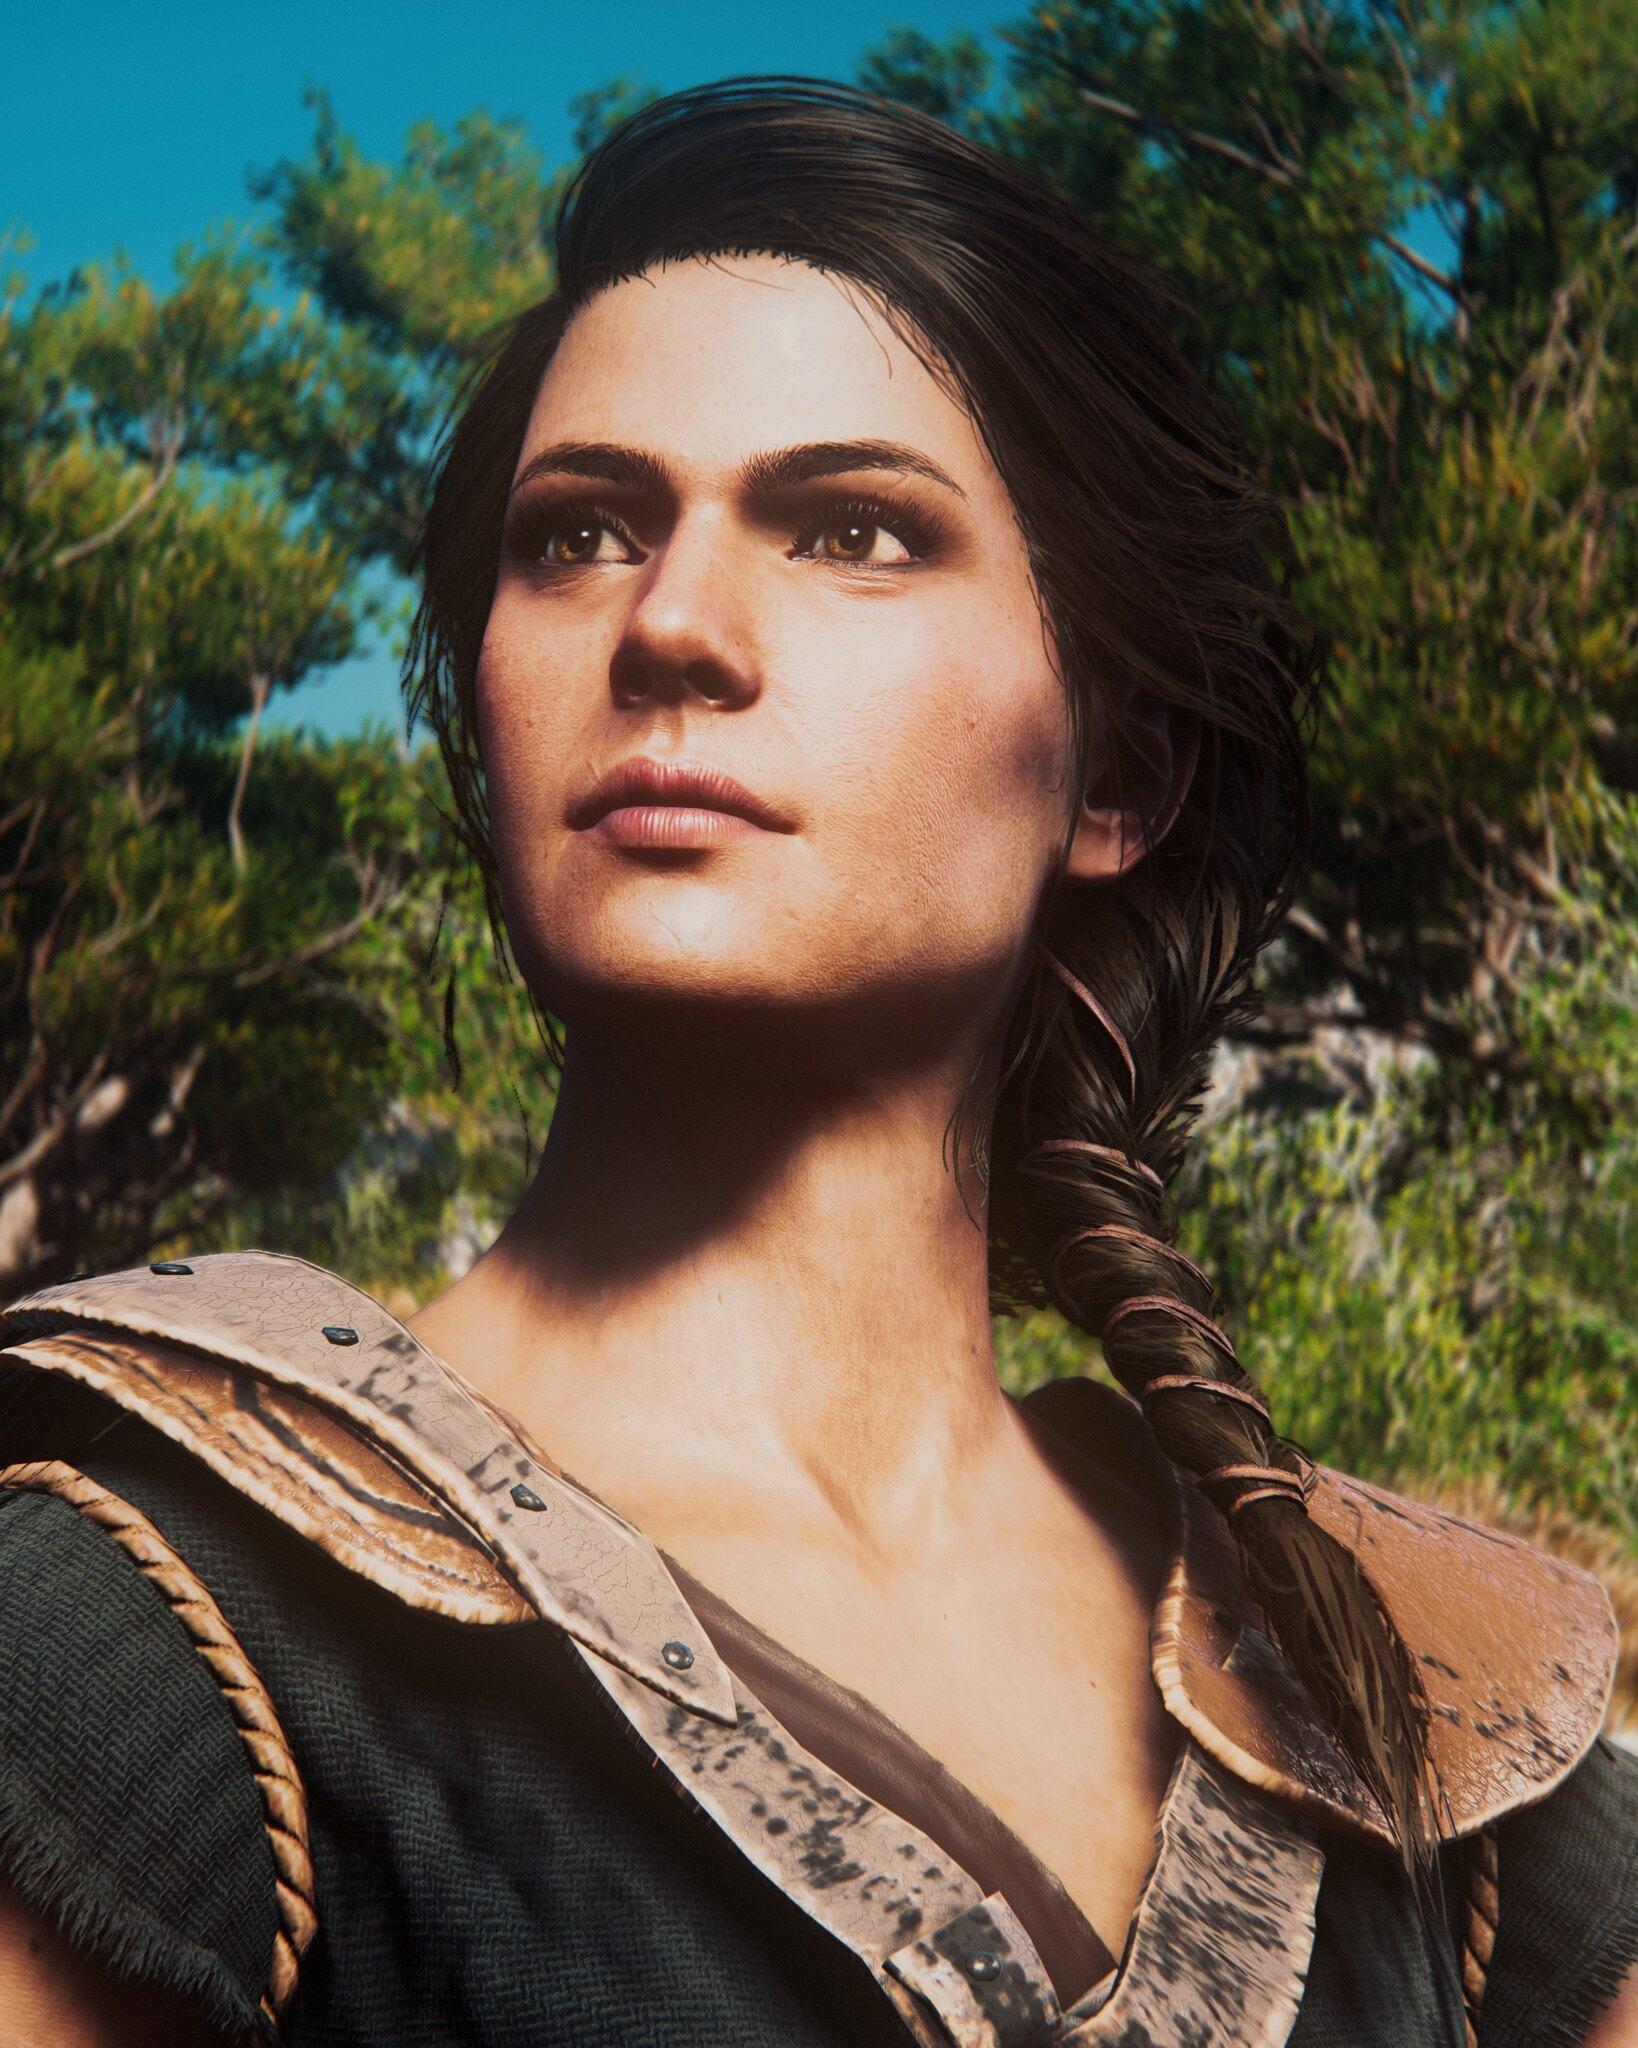 49402716398_c12834d52a_k.jpg - Assassin's Creed: Odyssey